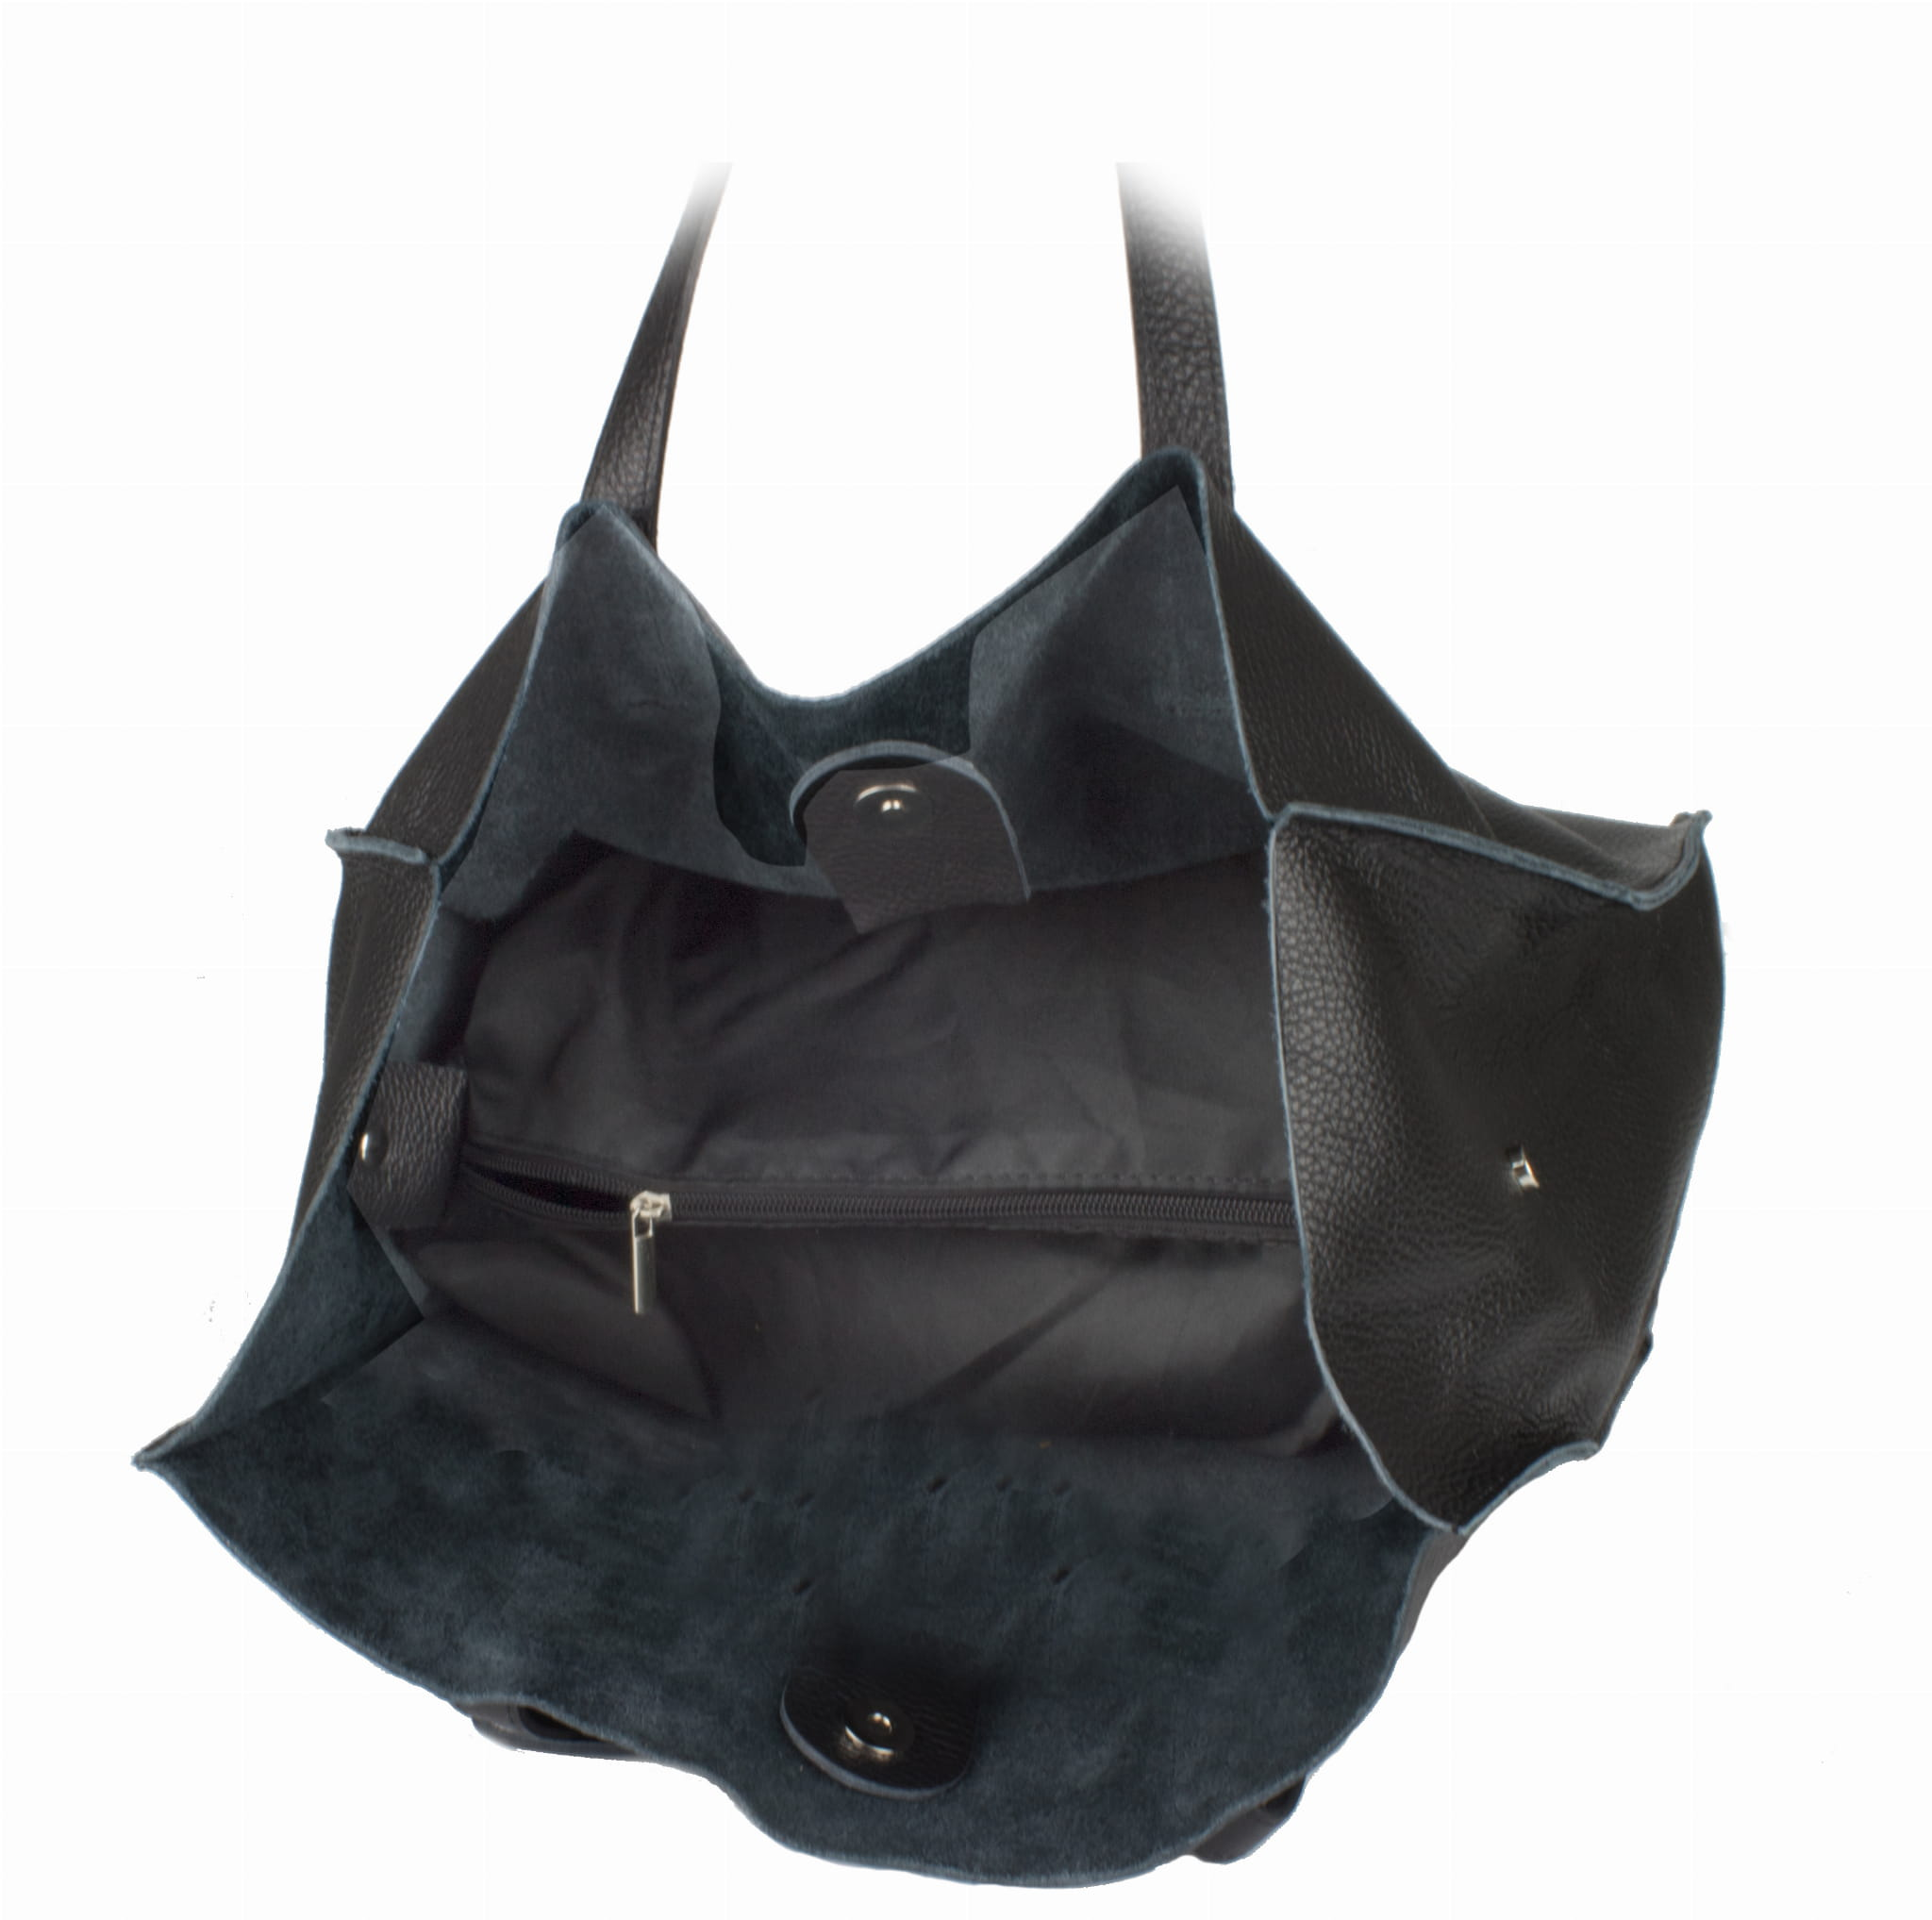 Włoska torebka skórzana Shopper Bag (id 501)